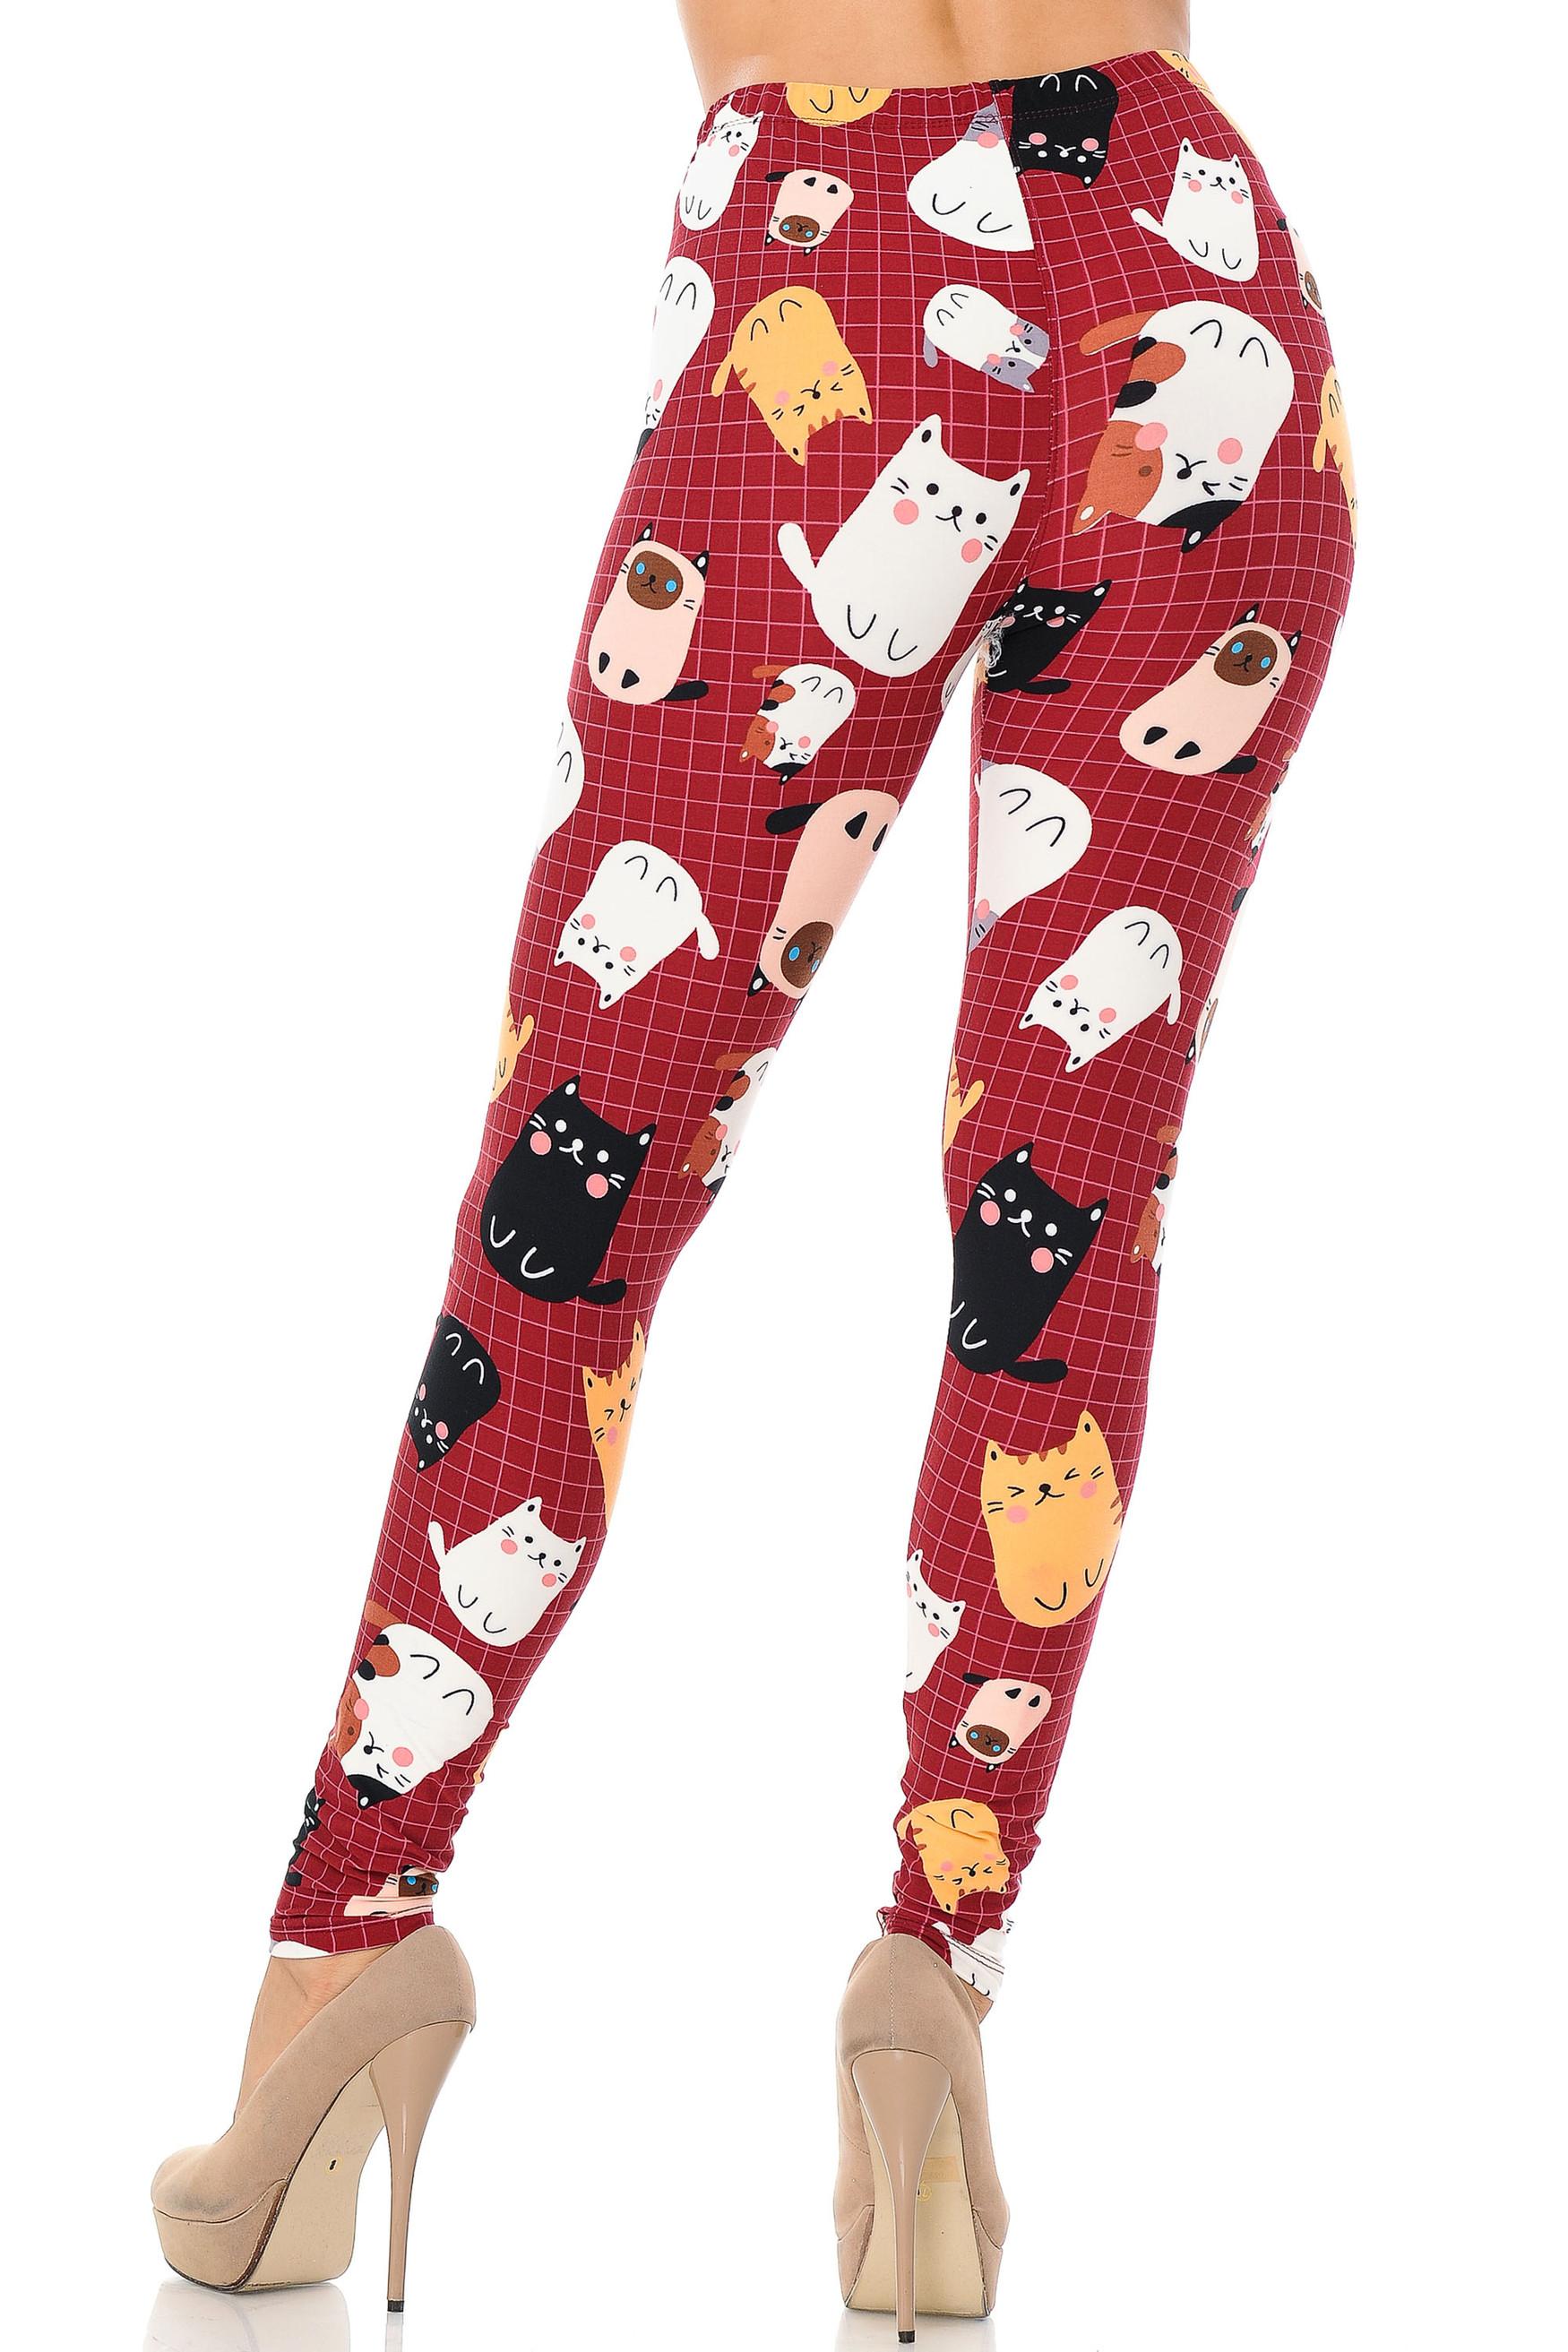 Brushed Cartoon Kitty Cats Extra Plus Size Leggings - 3X-5X